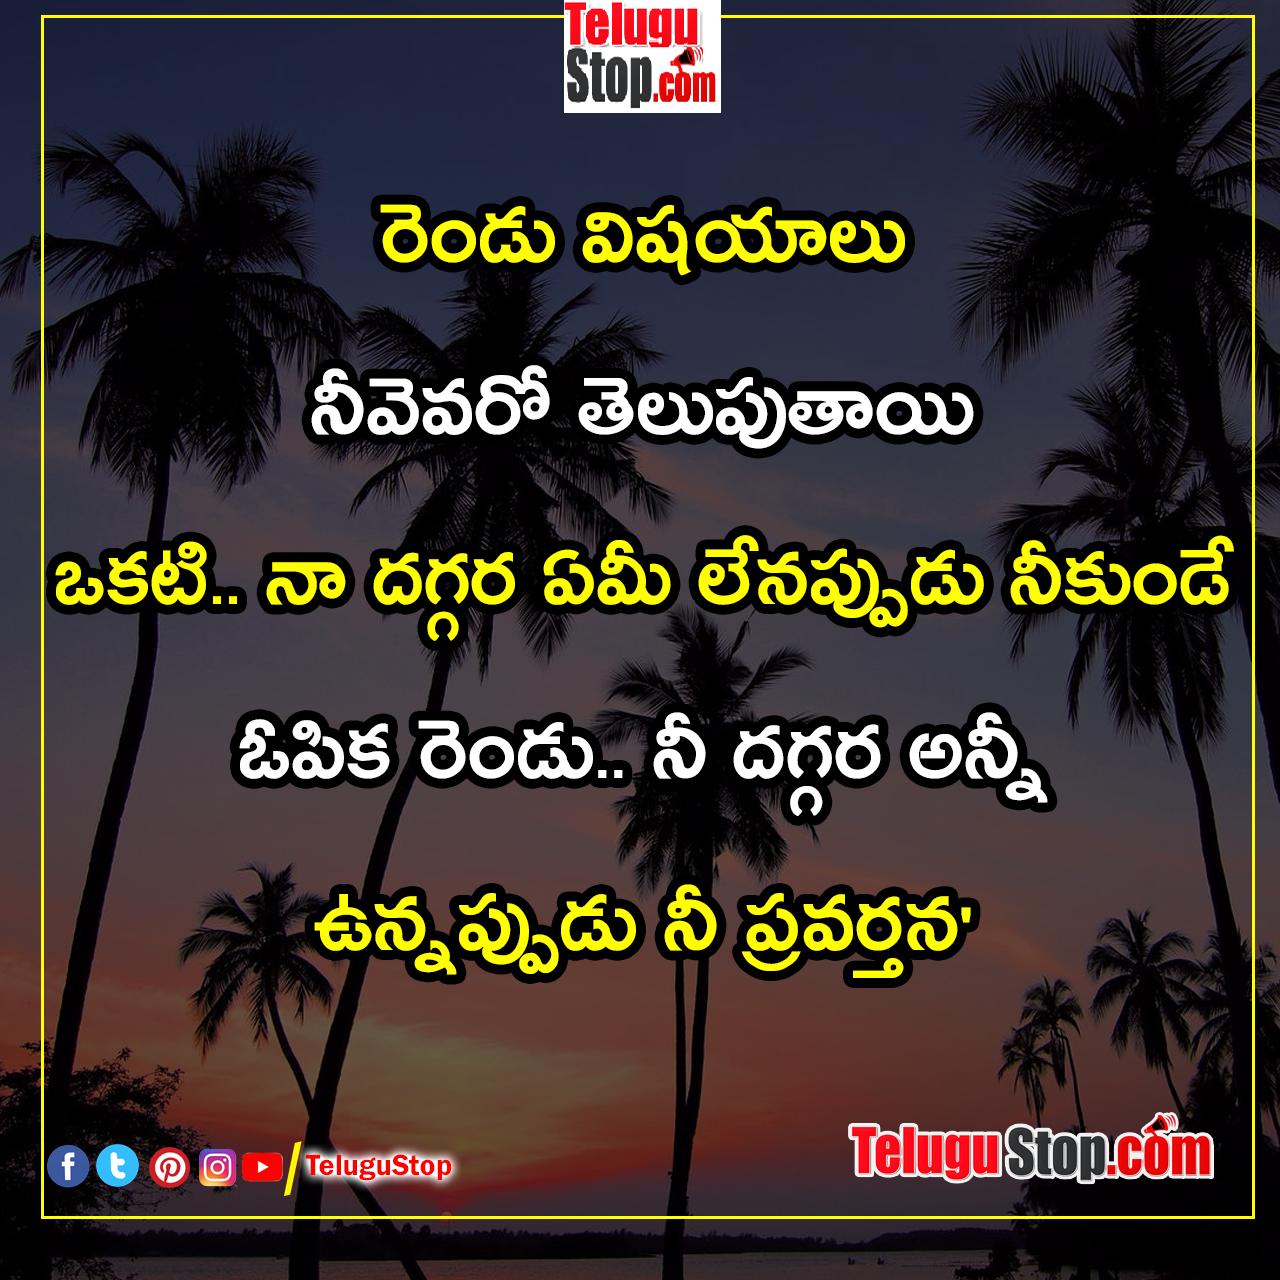 Attitude quotes in telugu images download Inspirational Quote